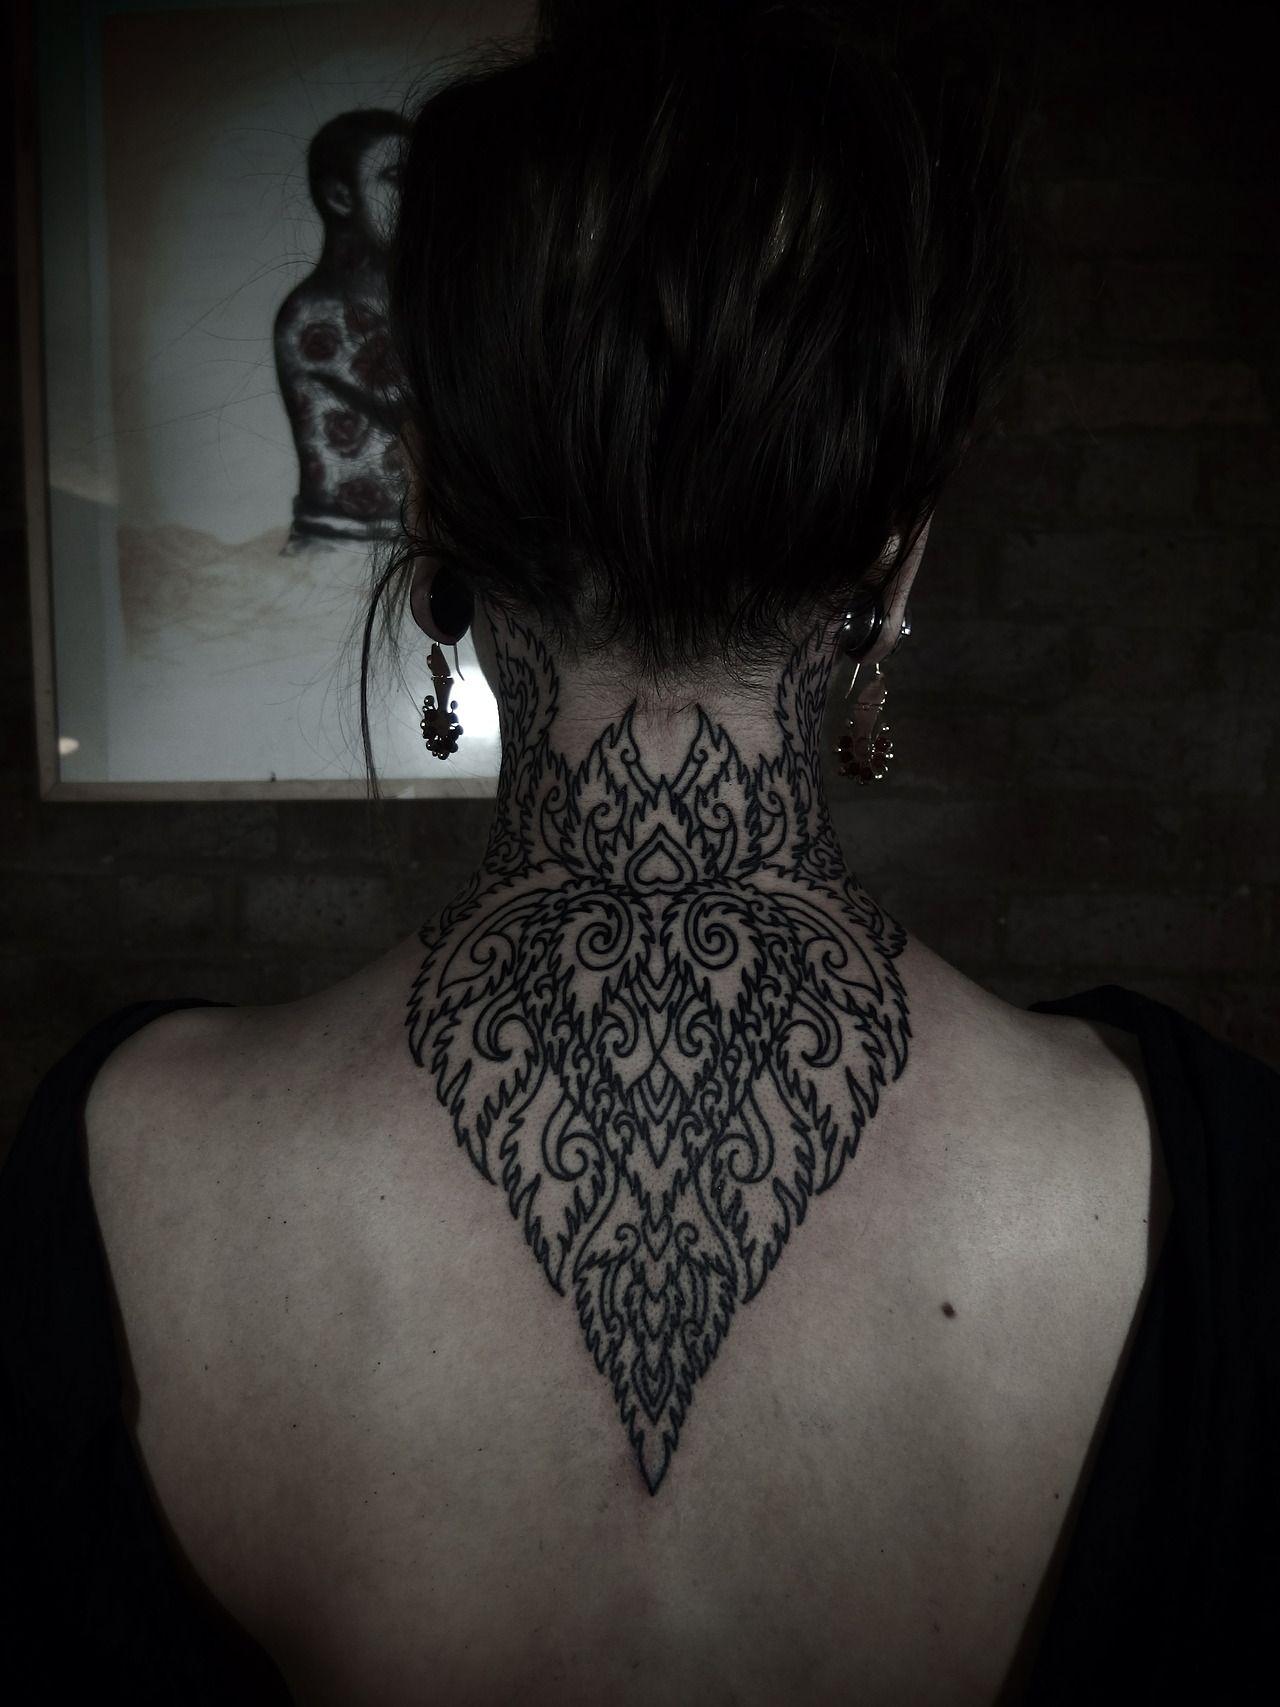 72e61738d48d9 Back of the neck design | That ink | Tribal tattoos, Back of neck ...